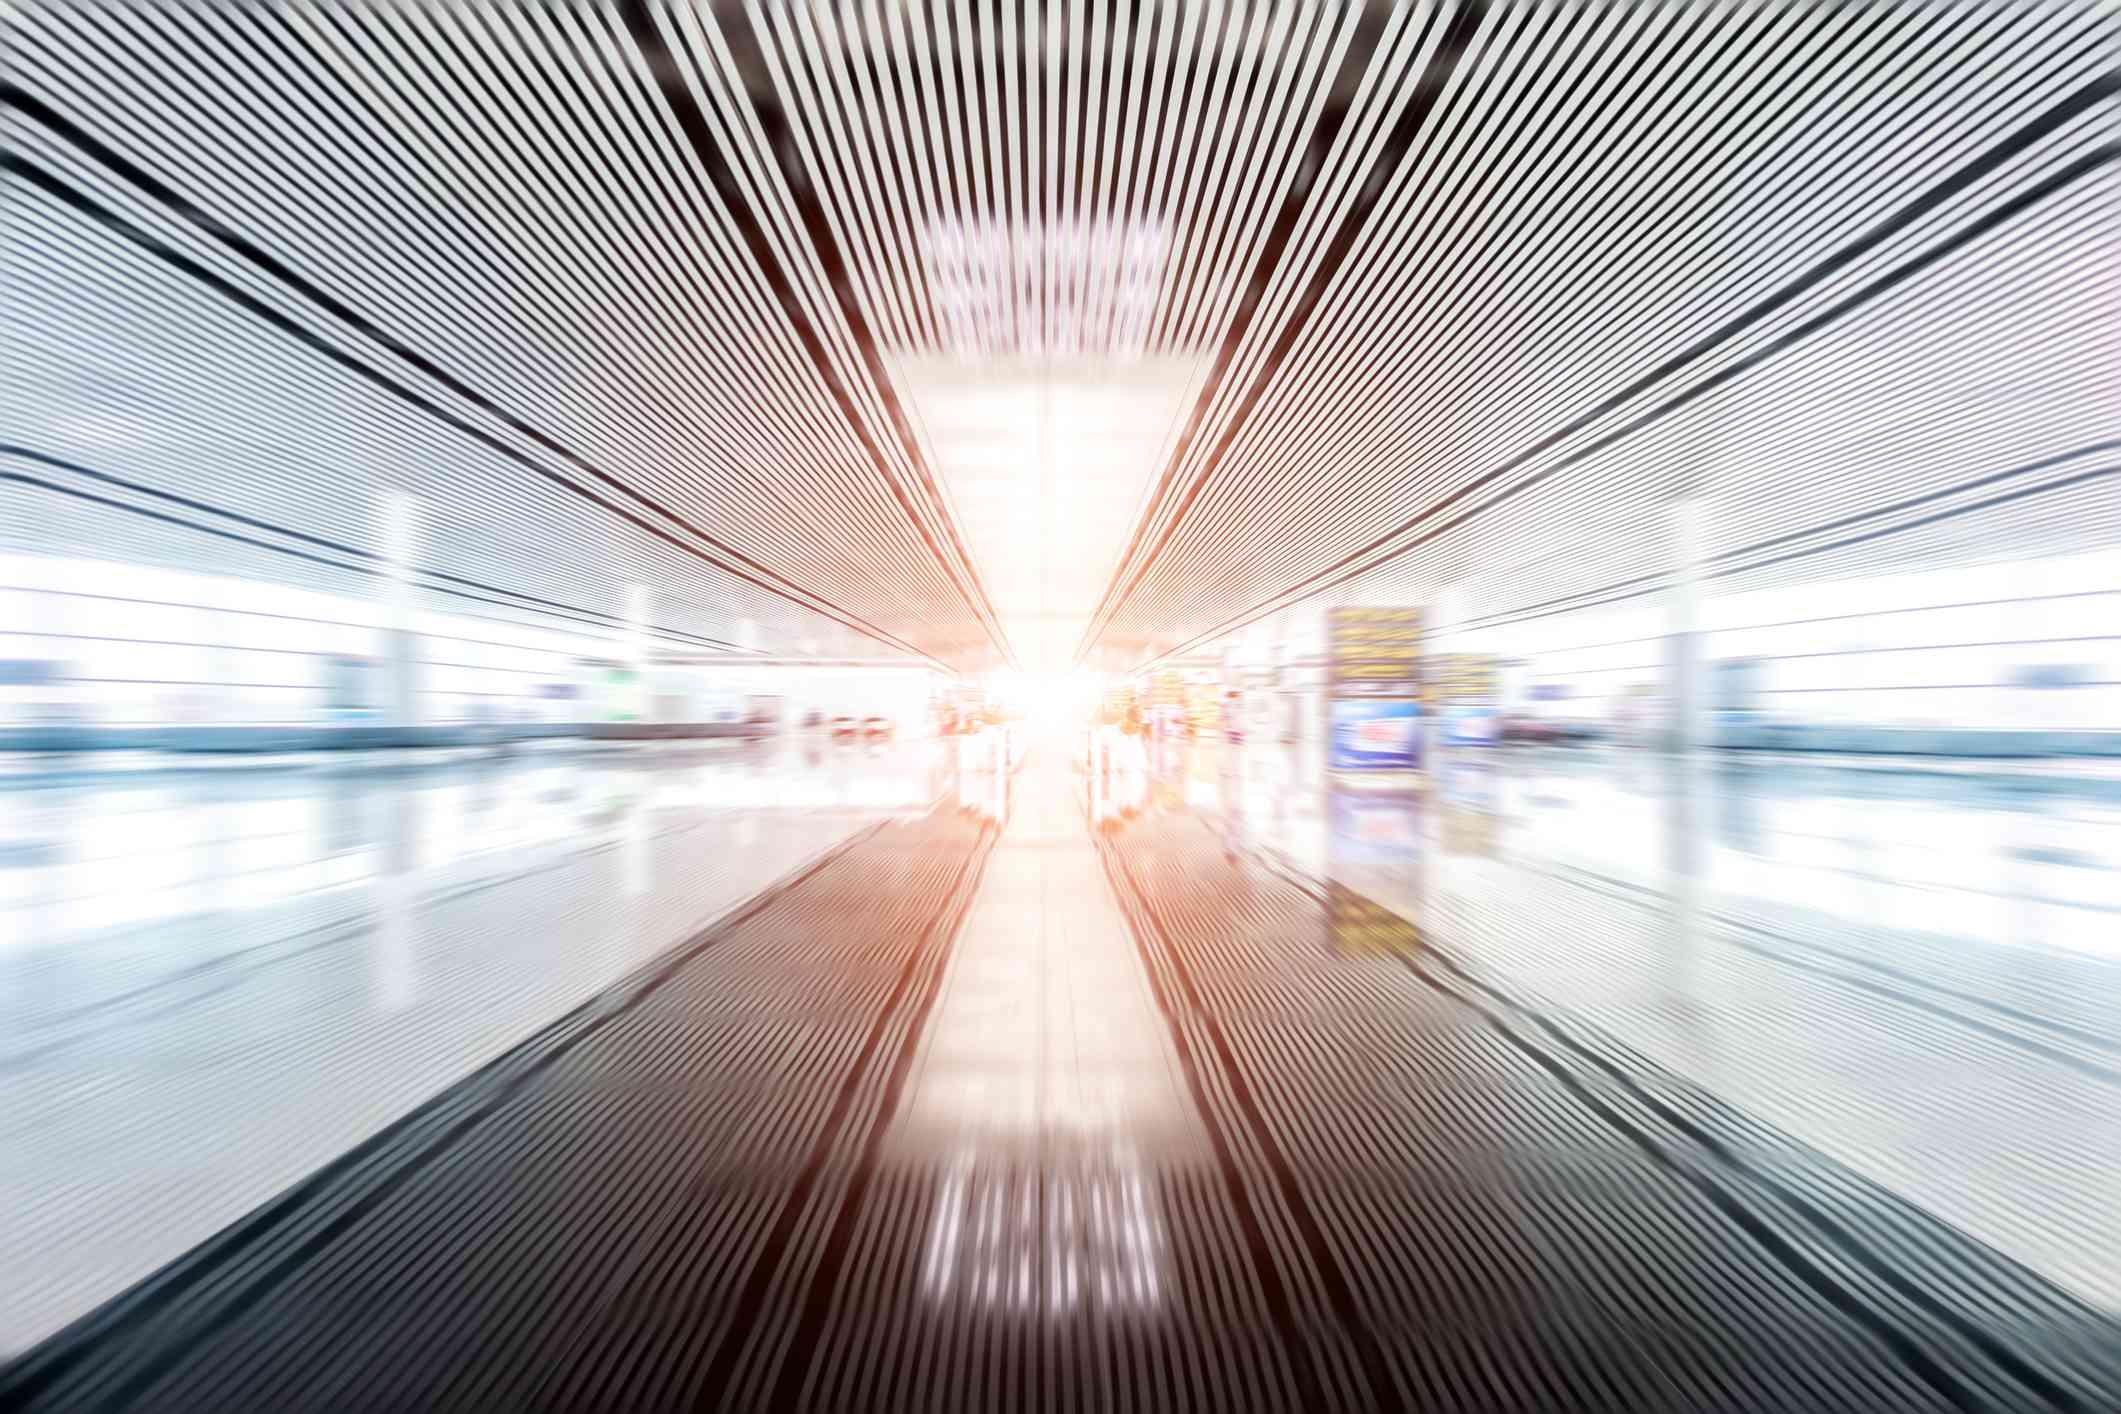 Interior of an airport terminal